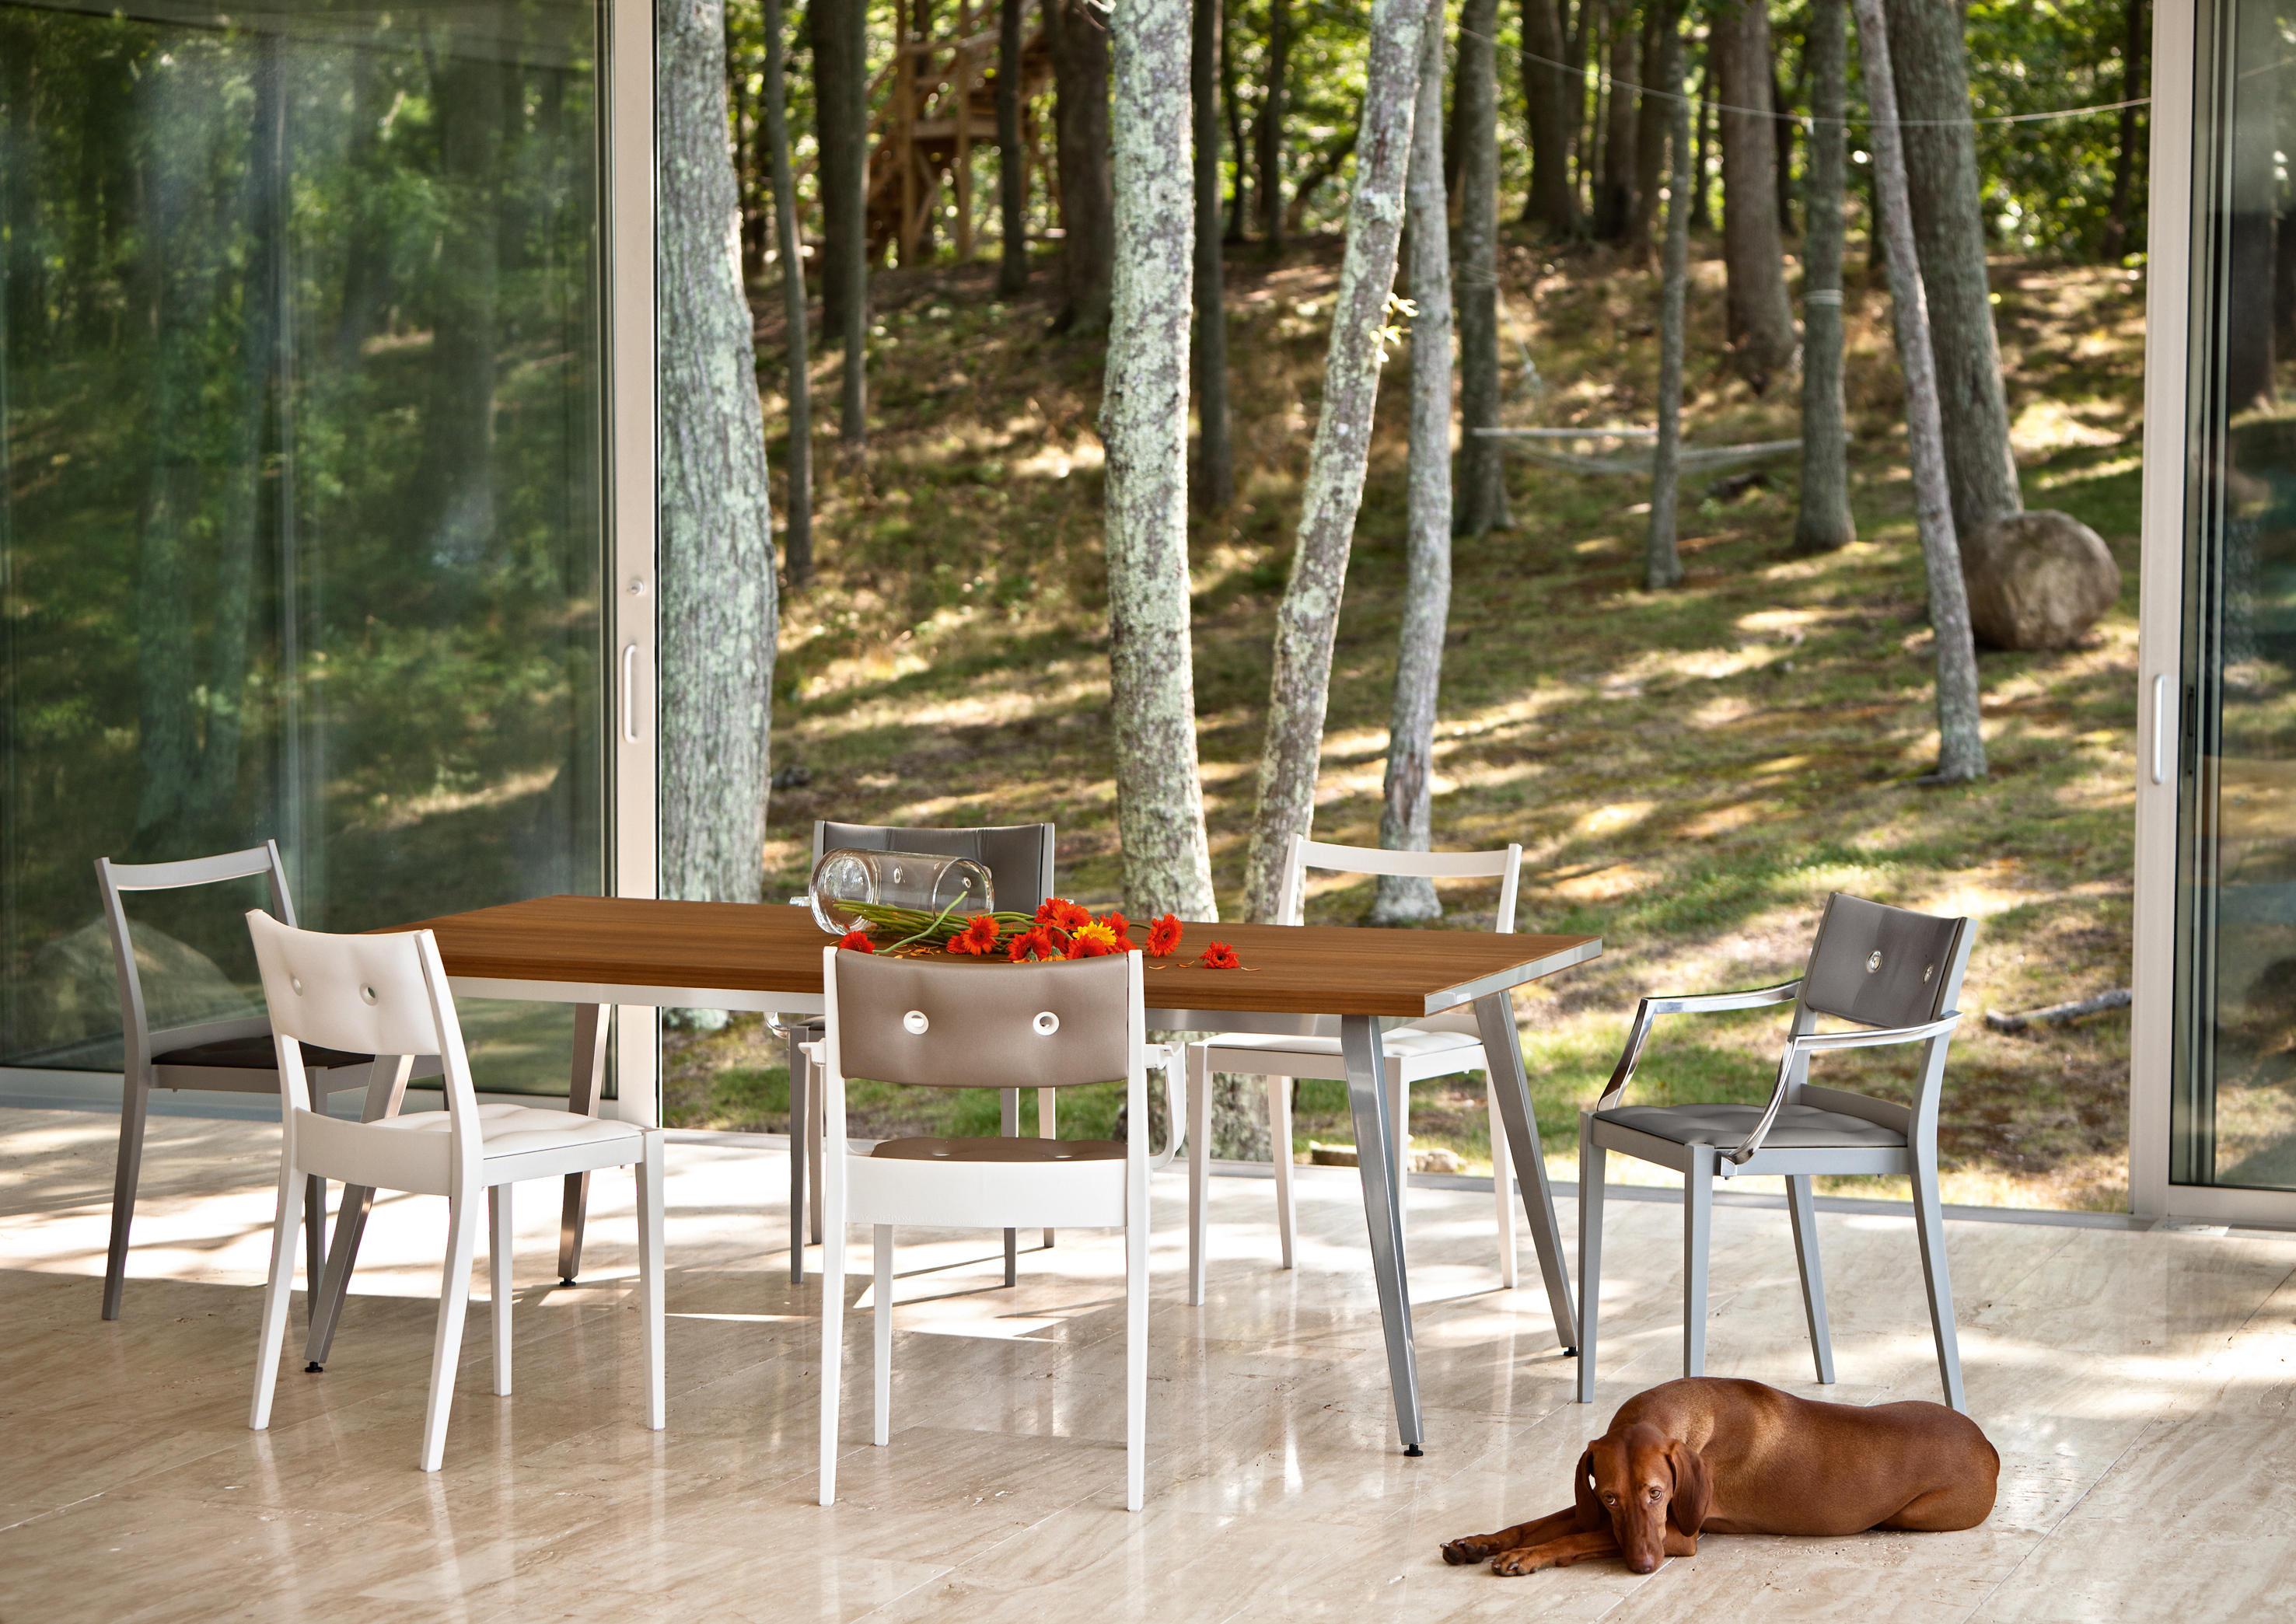 play armlehnstuhl mehrzweckst hle von dedon architonic. Black Bedroom Furniture Sets. Home Design Ideas